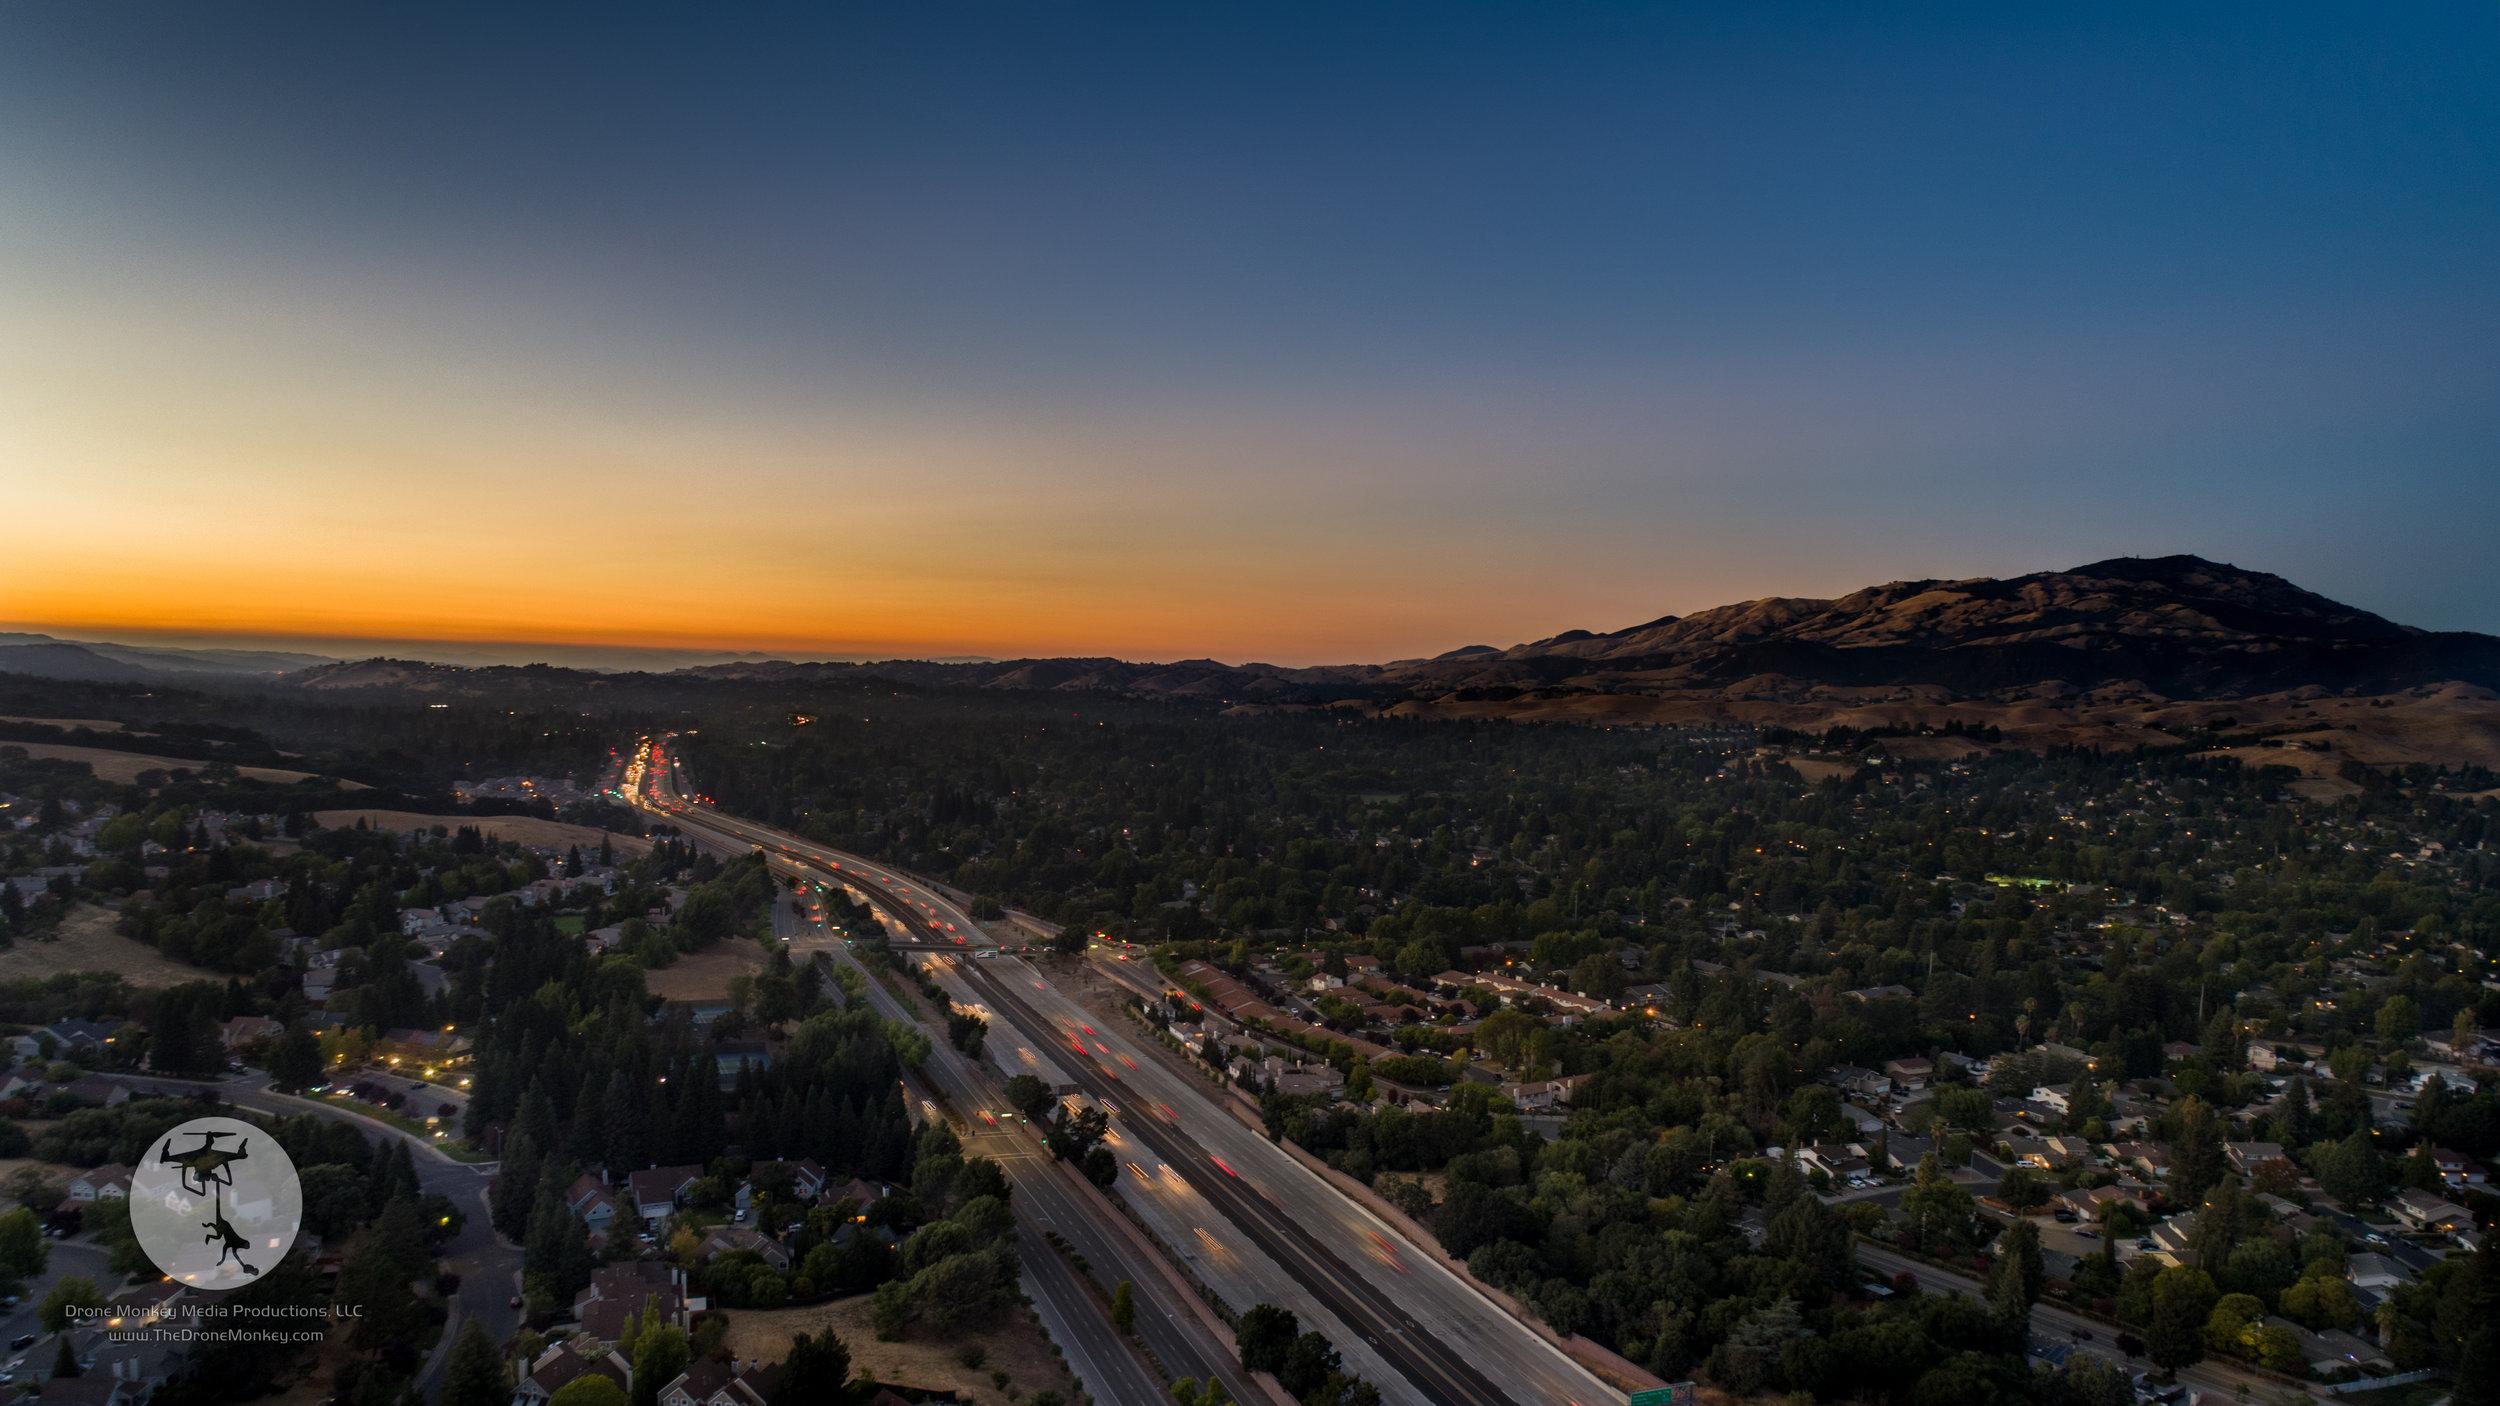 Sunset over Danville, CA